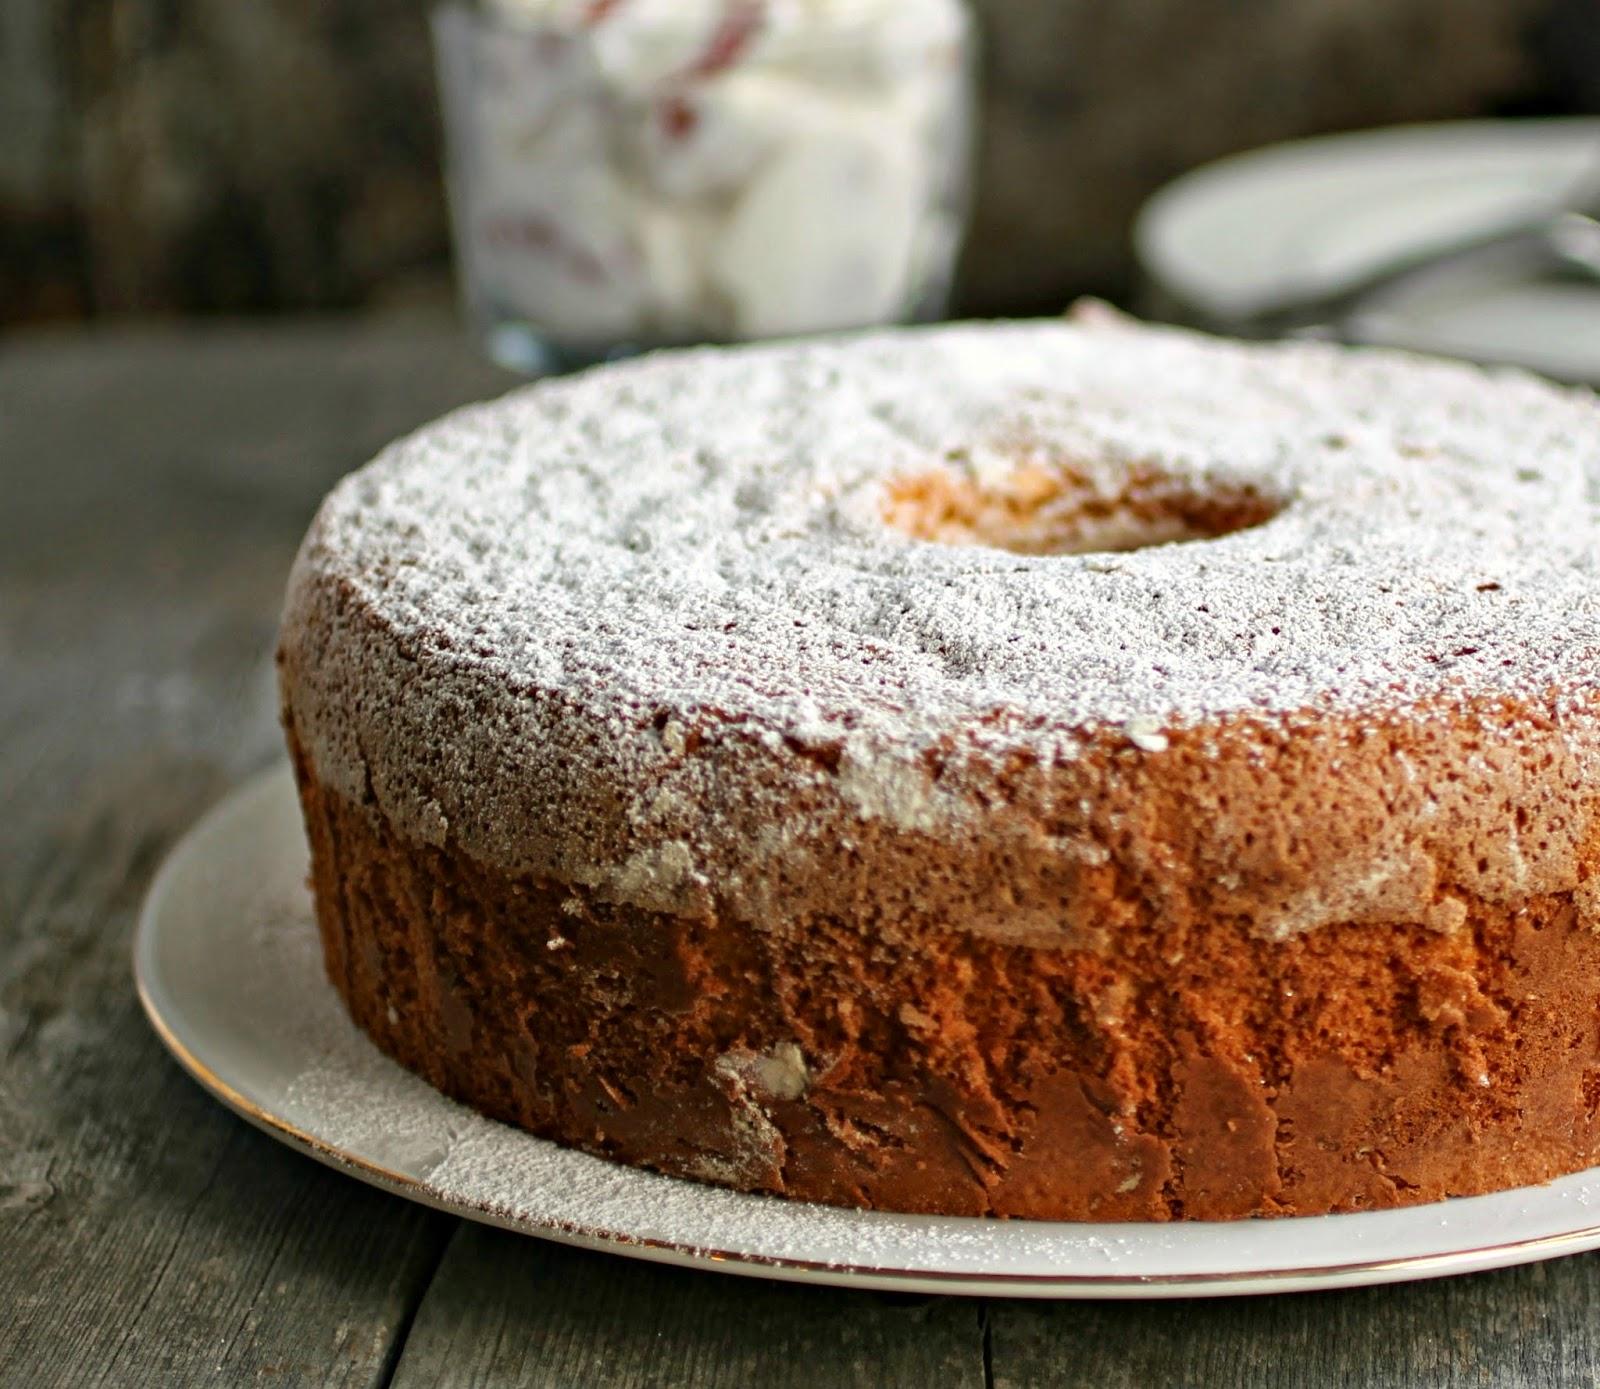 Mom's Extra Tall Sponge Cake